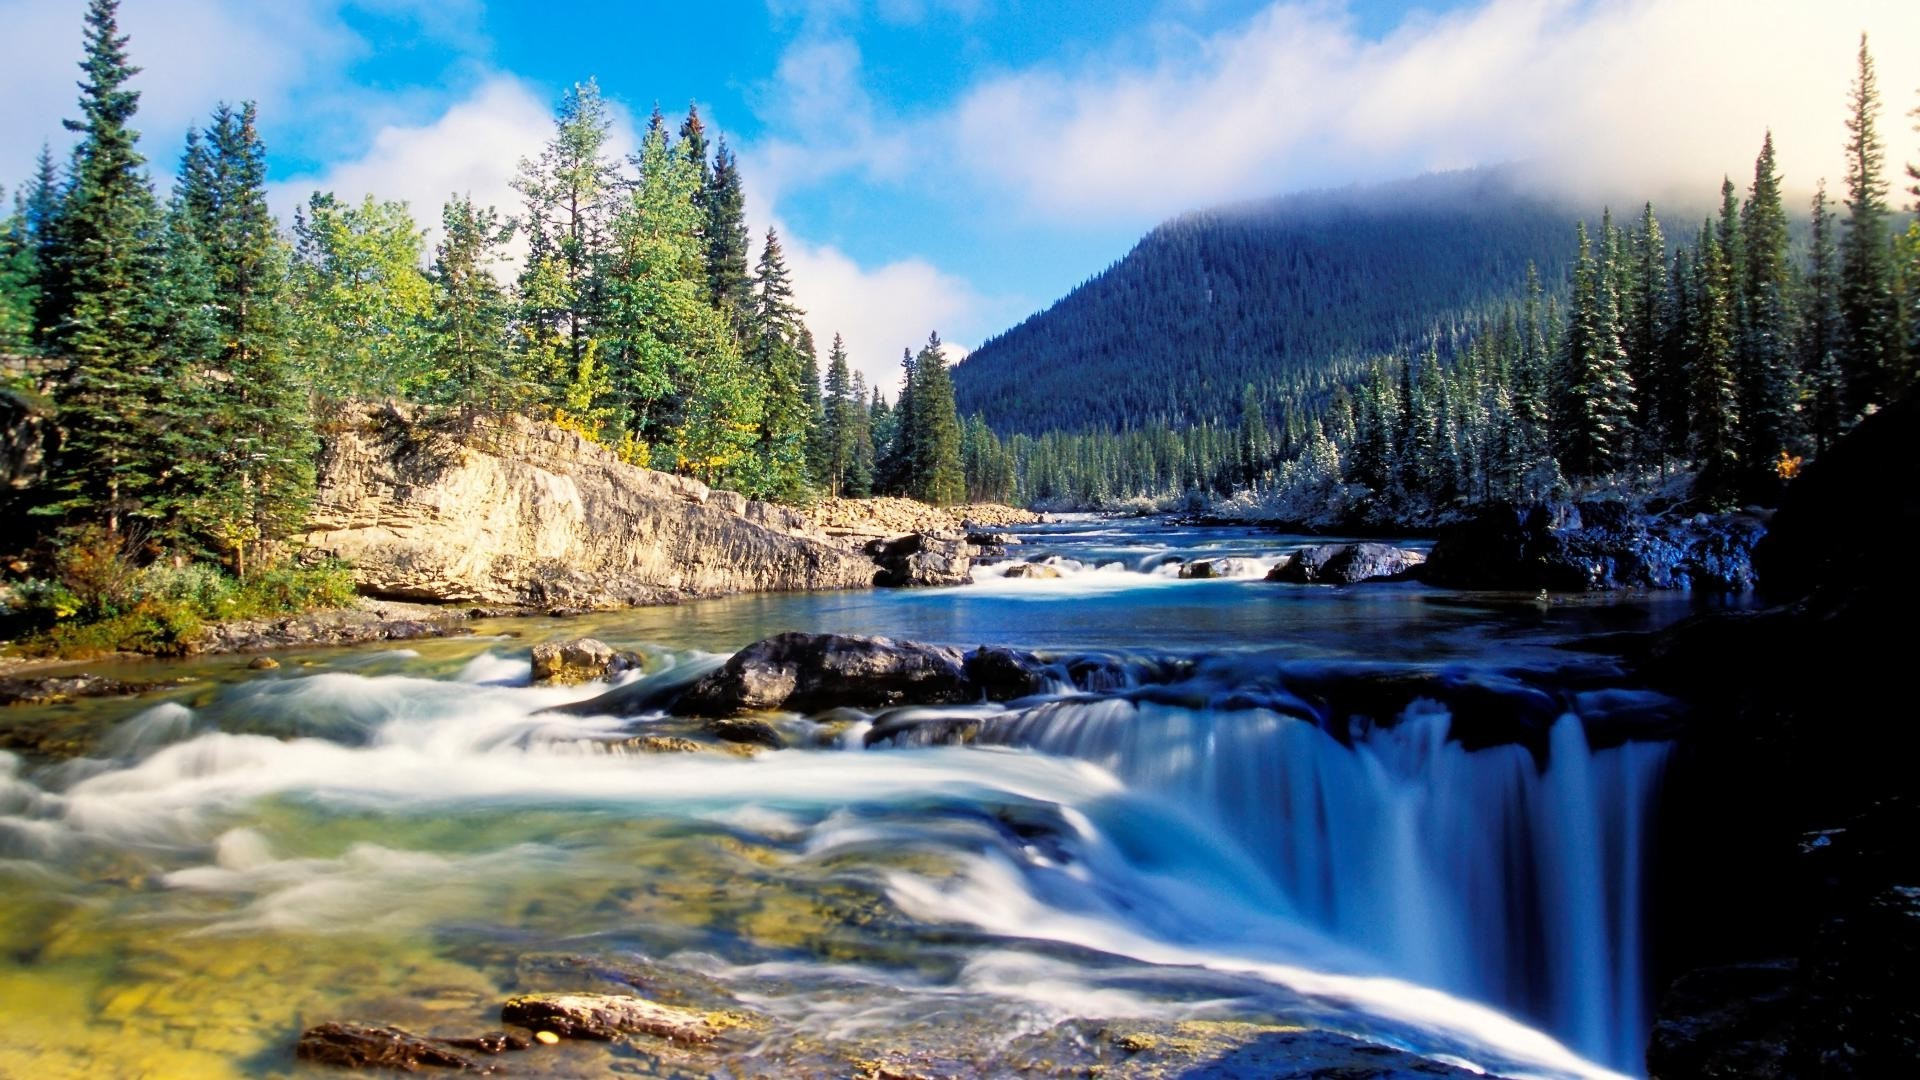 Nature Wallpaper: Beautiful Wallpaper HD Resolution for Wallpaper Free HD  Wallpapers Wallpapers Nature Wallpapers)